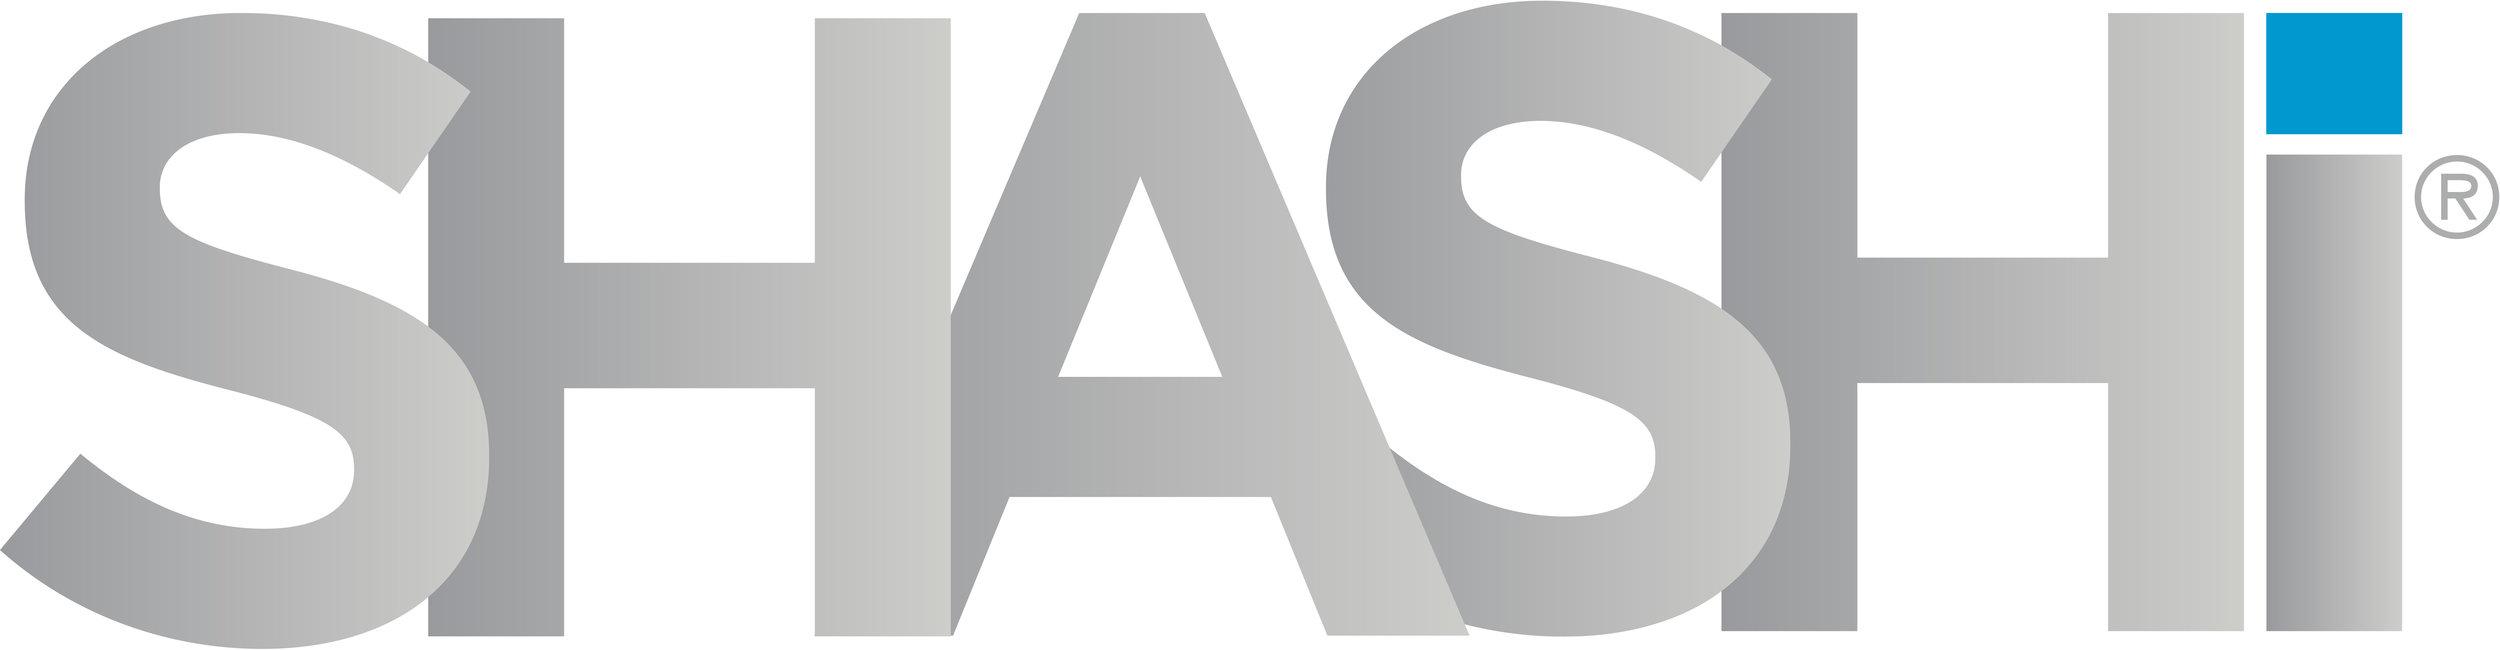 Shashi-Logo.jpg